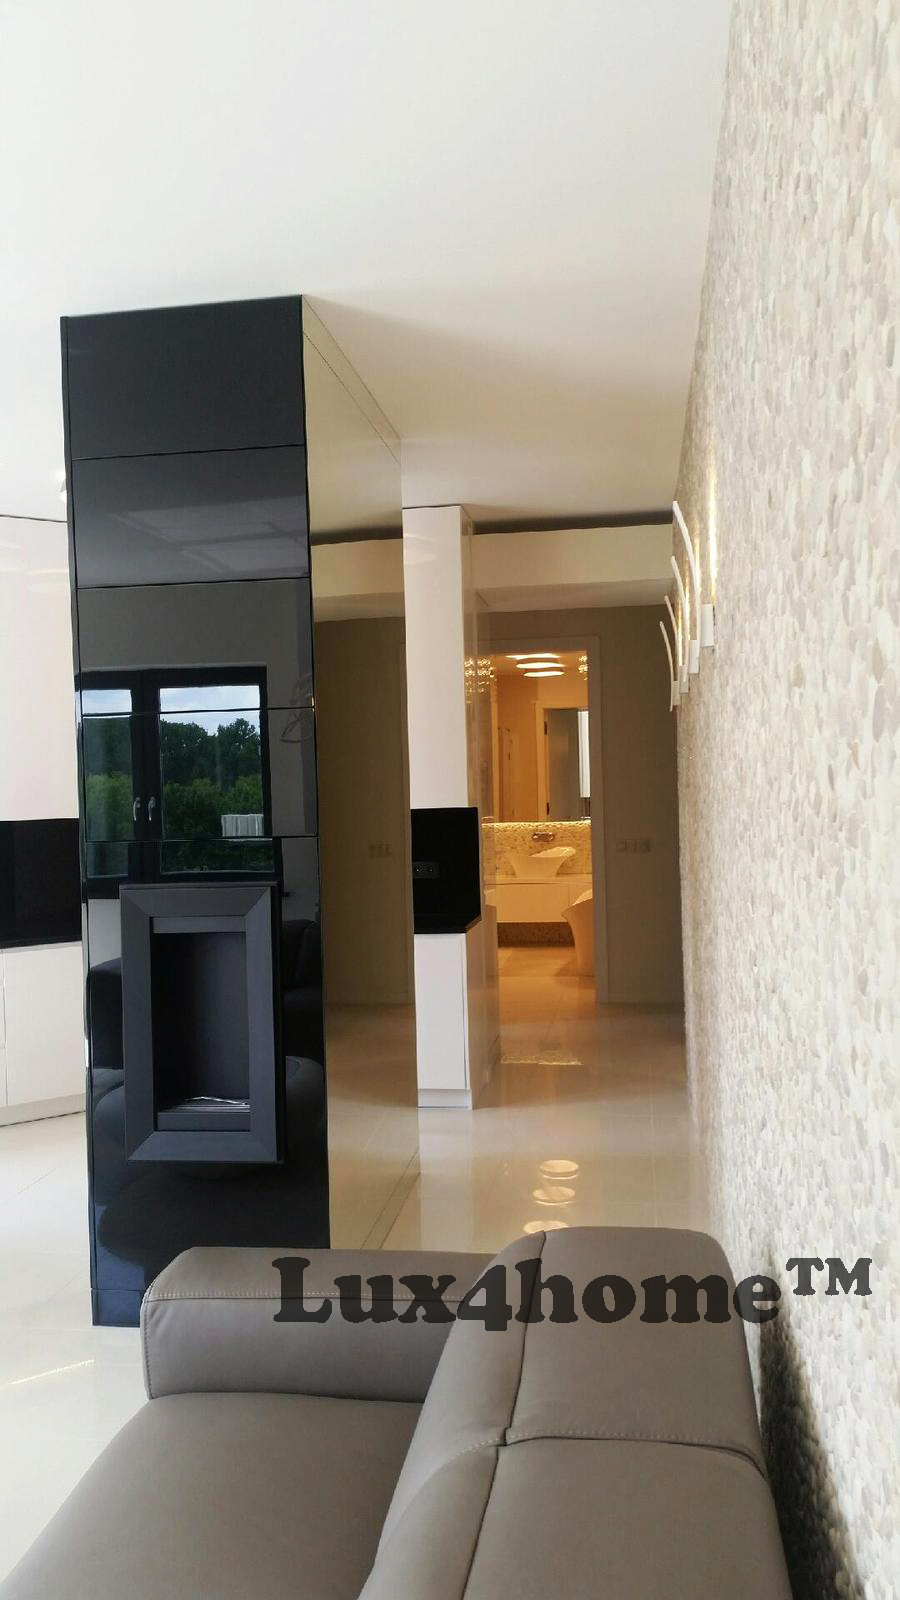 Luxury Apartment With Pebble Tiles On Walls Beige Pebble